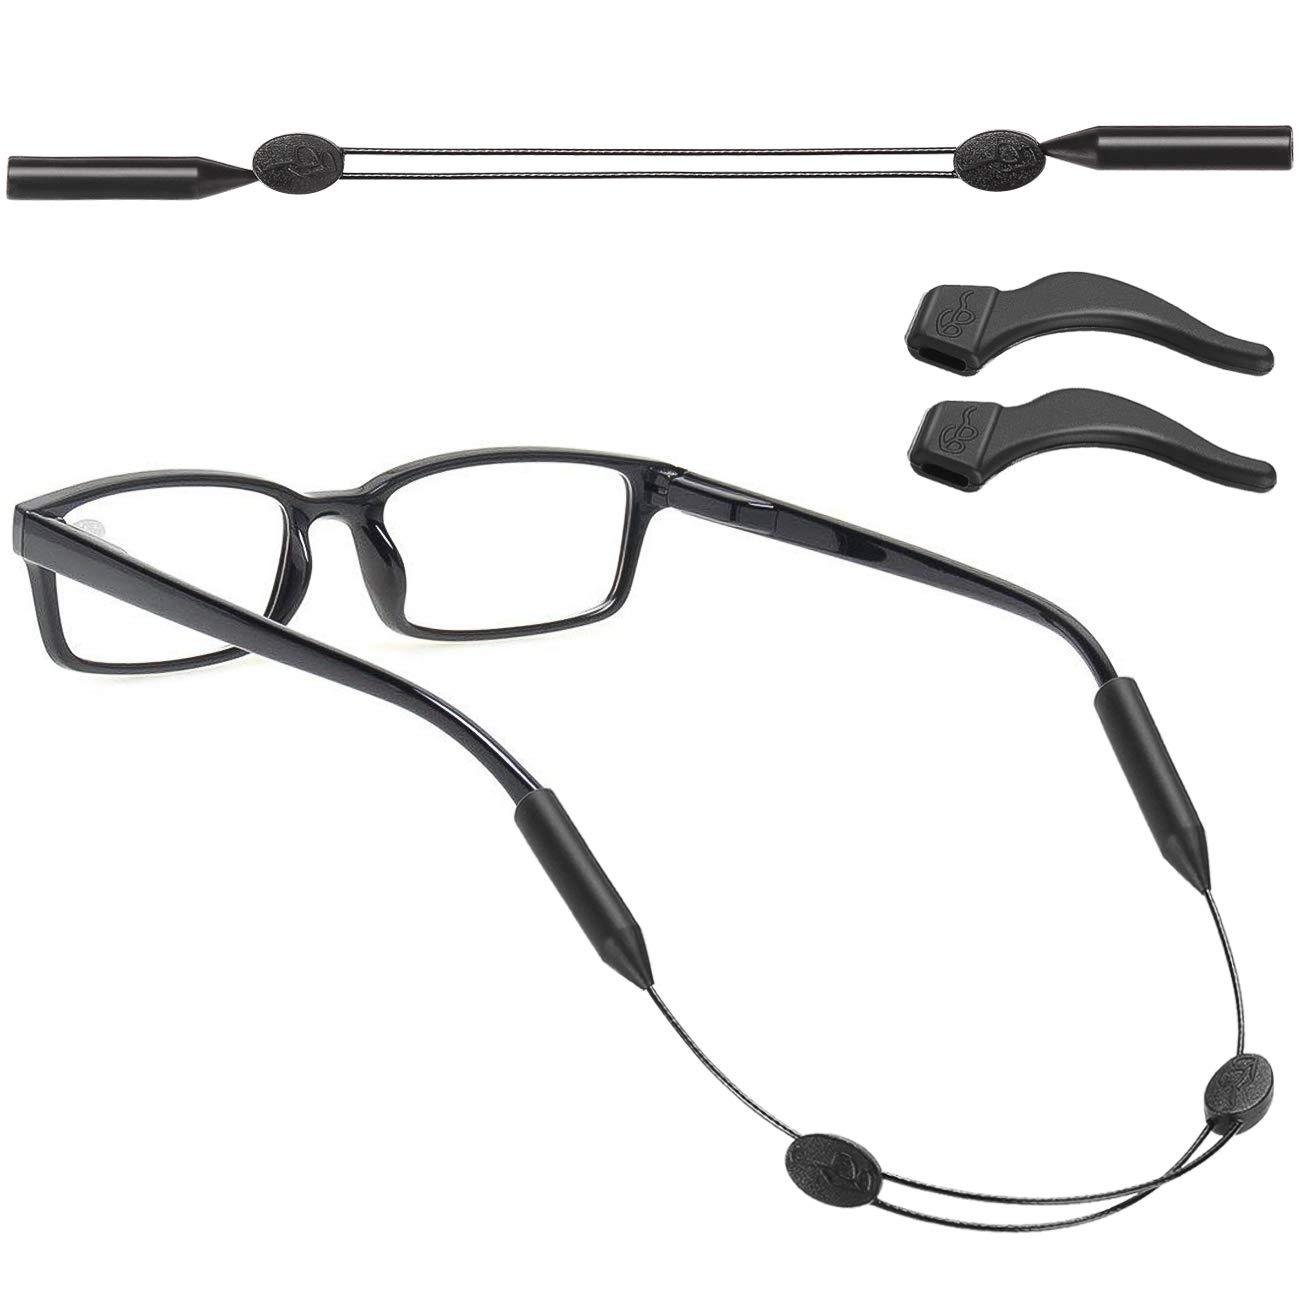 LovYu 眼鏡リテーナー 調節可能なスポーツサングラスホルダーストラップ 大人&子供用 ユニバーサルメガネ保持ホルダーシステム ハンティング&サイクリング ランニング 釣り ゴルフ キャンプ 野球用 B07H1X5LJY for adults